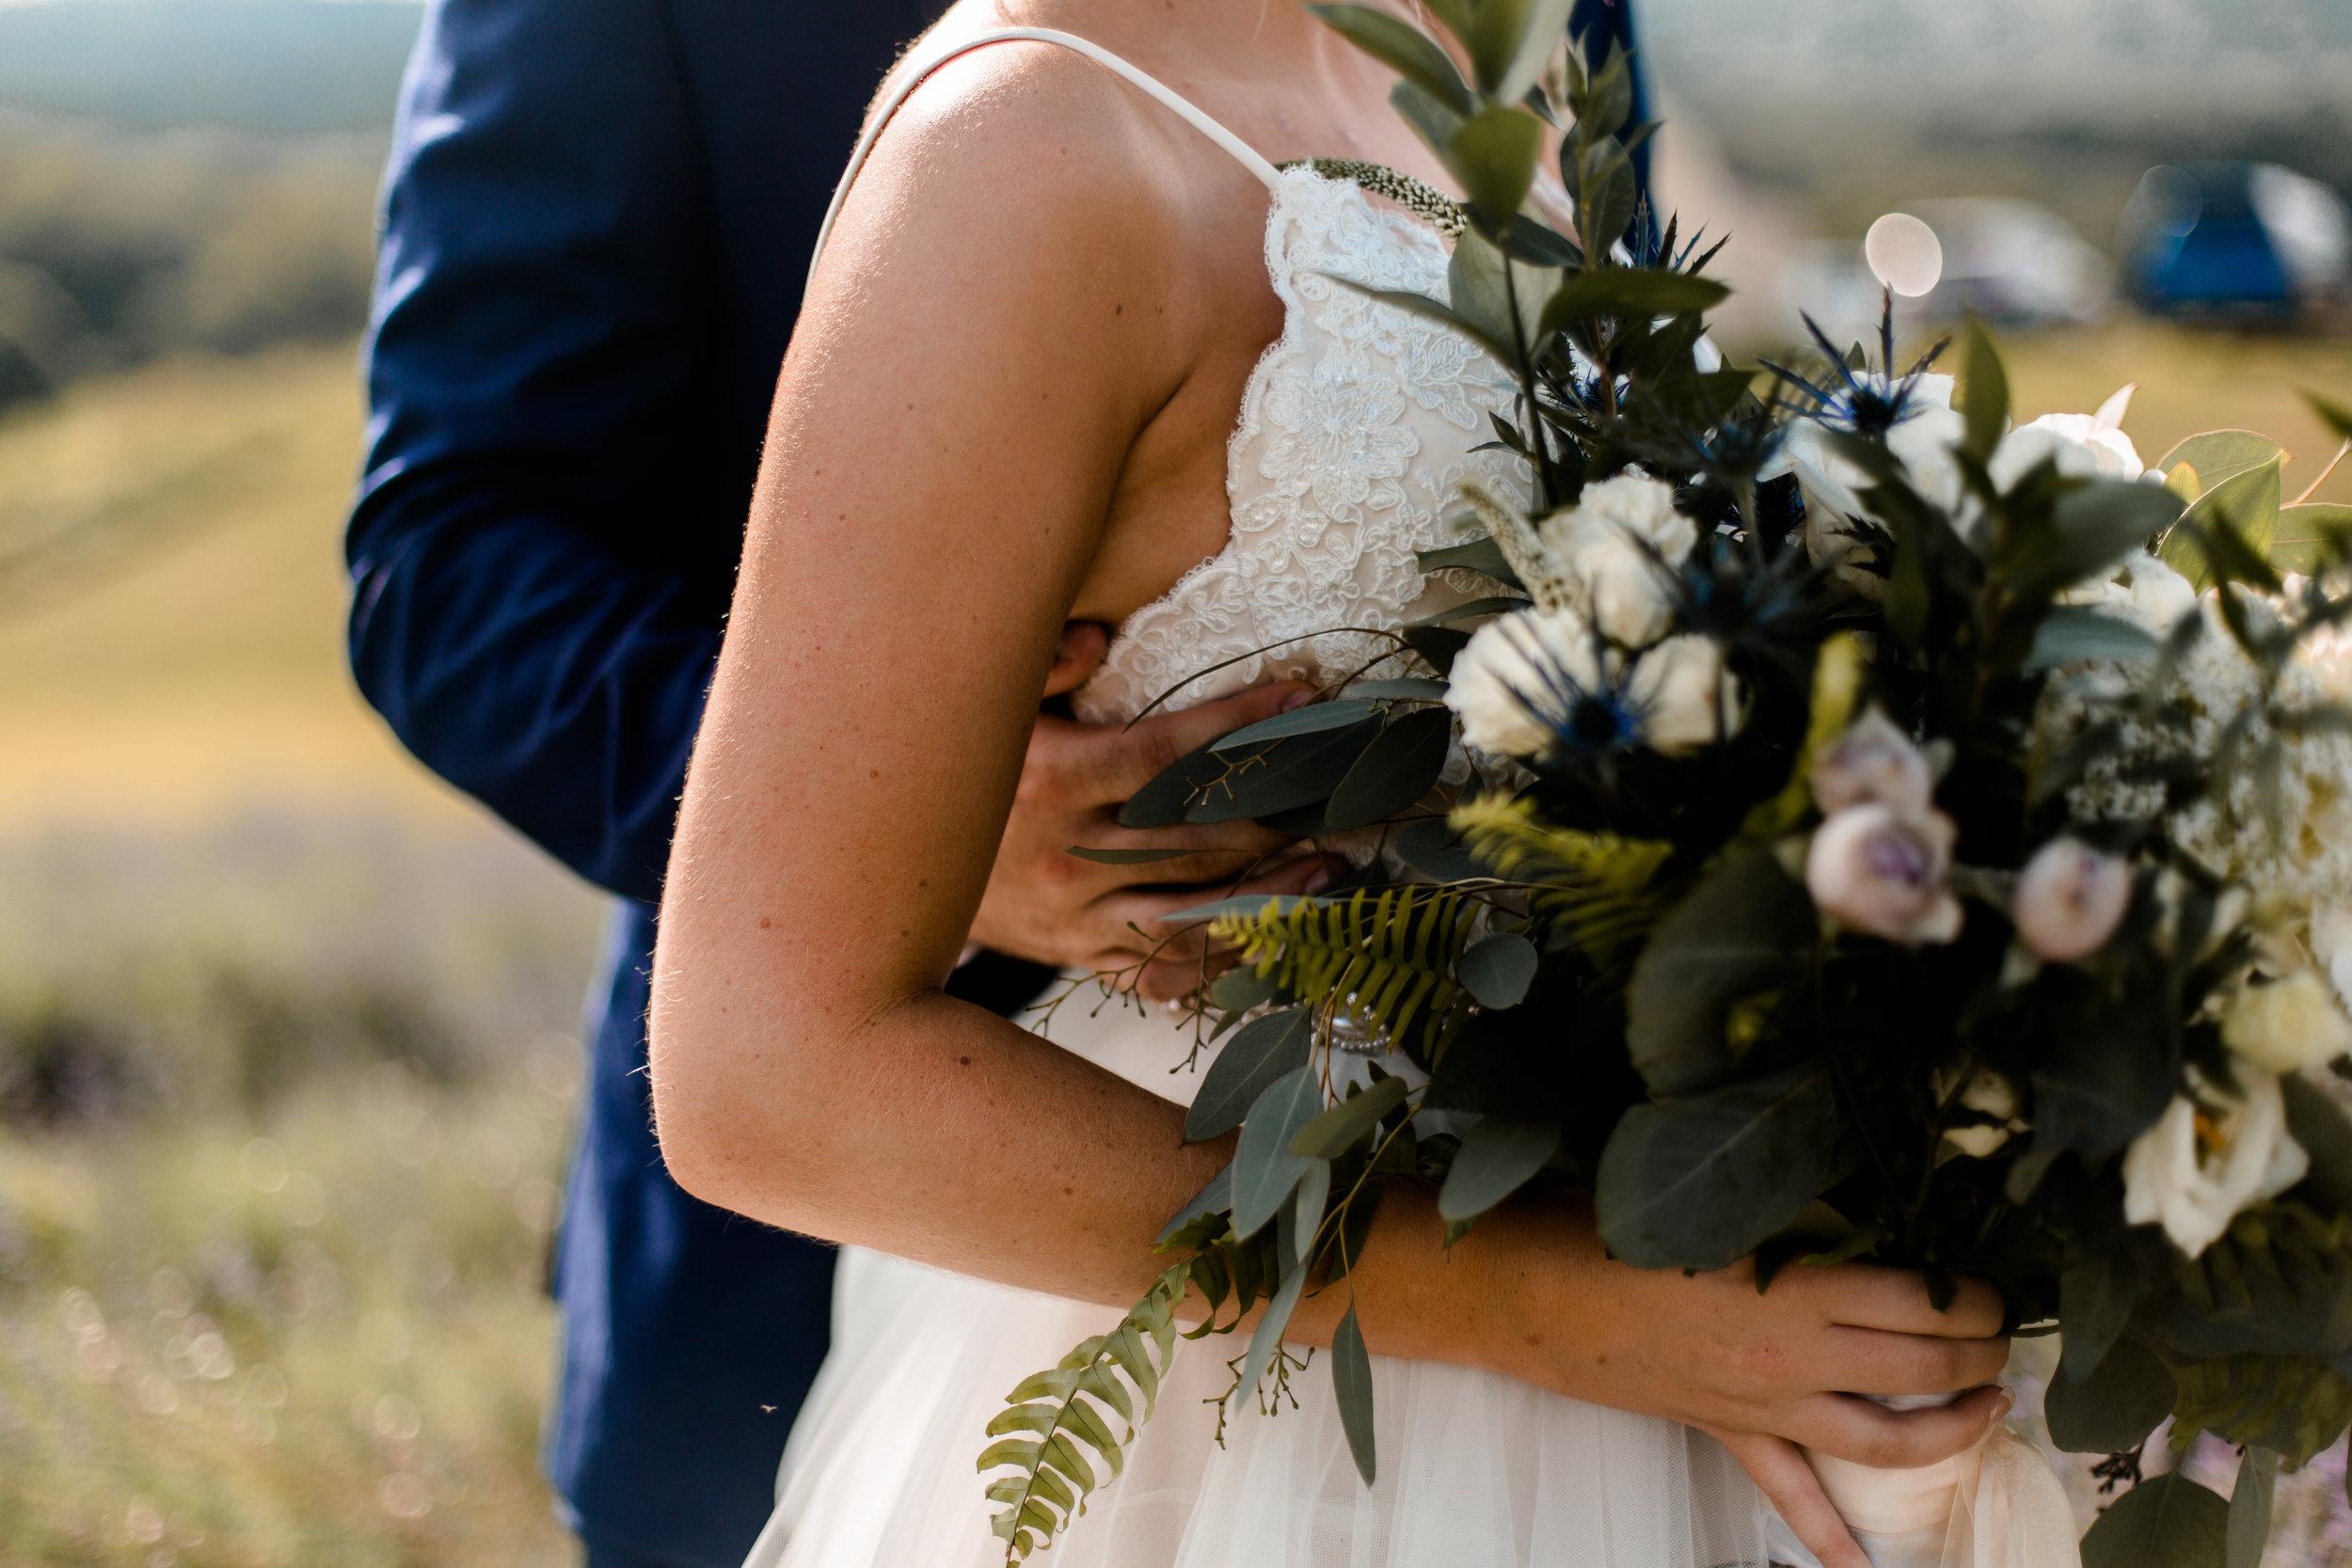 Nicole-Daacke-Photography-Adventurous-Elopement-Intimiate-Wedding-Destination-Wedding-Italian-Winery-Naples-Amalfi-Love-Photographer-9.jpg